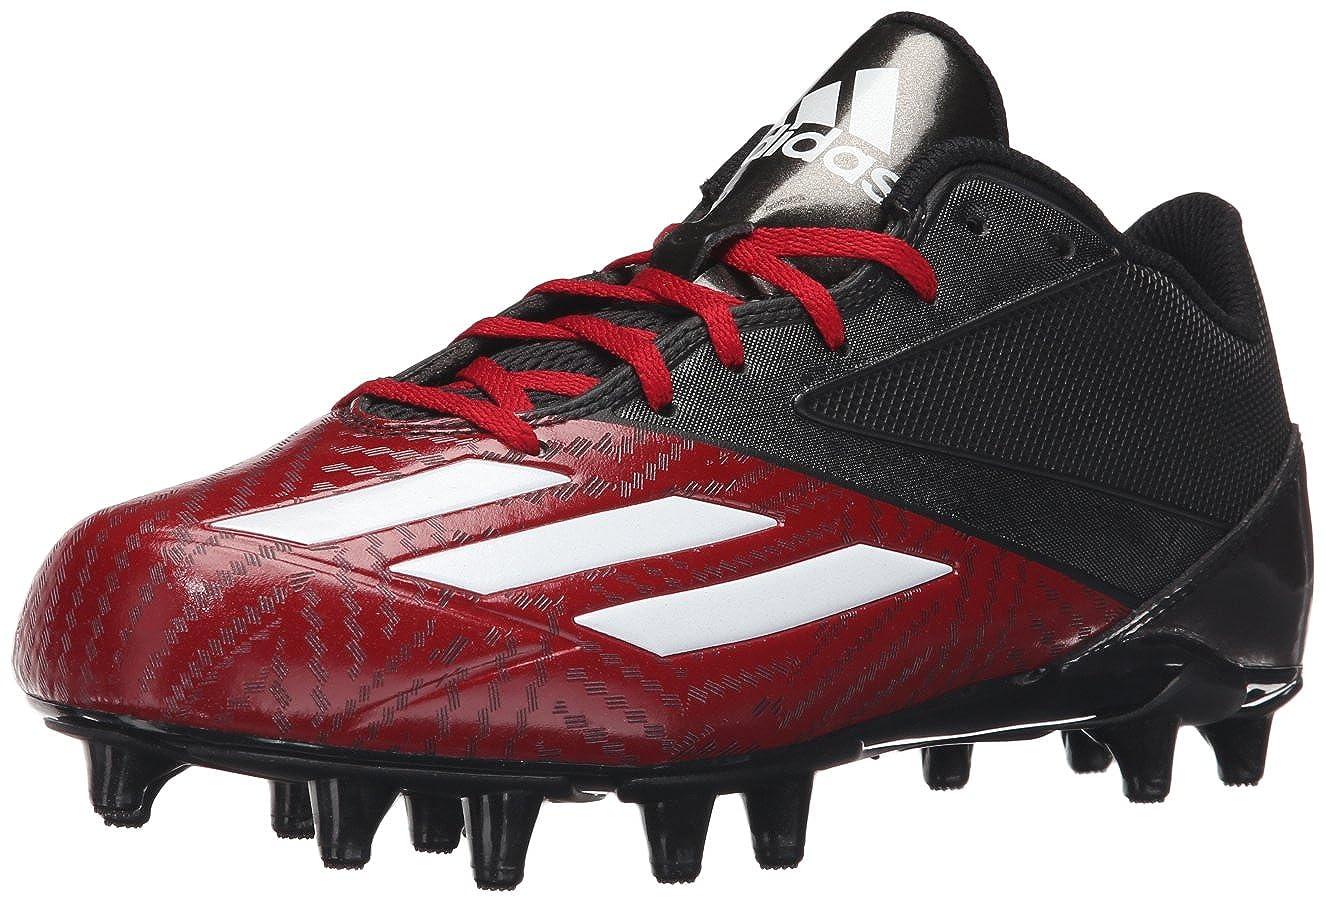 Adidas adidas5-star Niedrig-M - 5-Sterne, Niedrig Geschnitten Herren